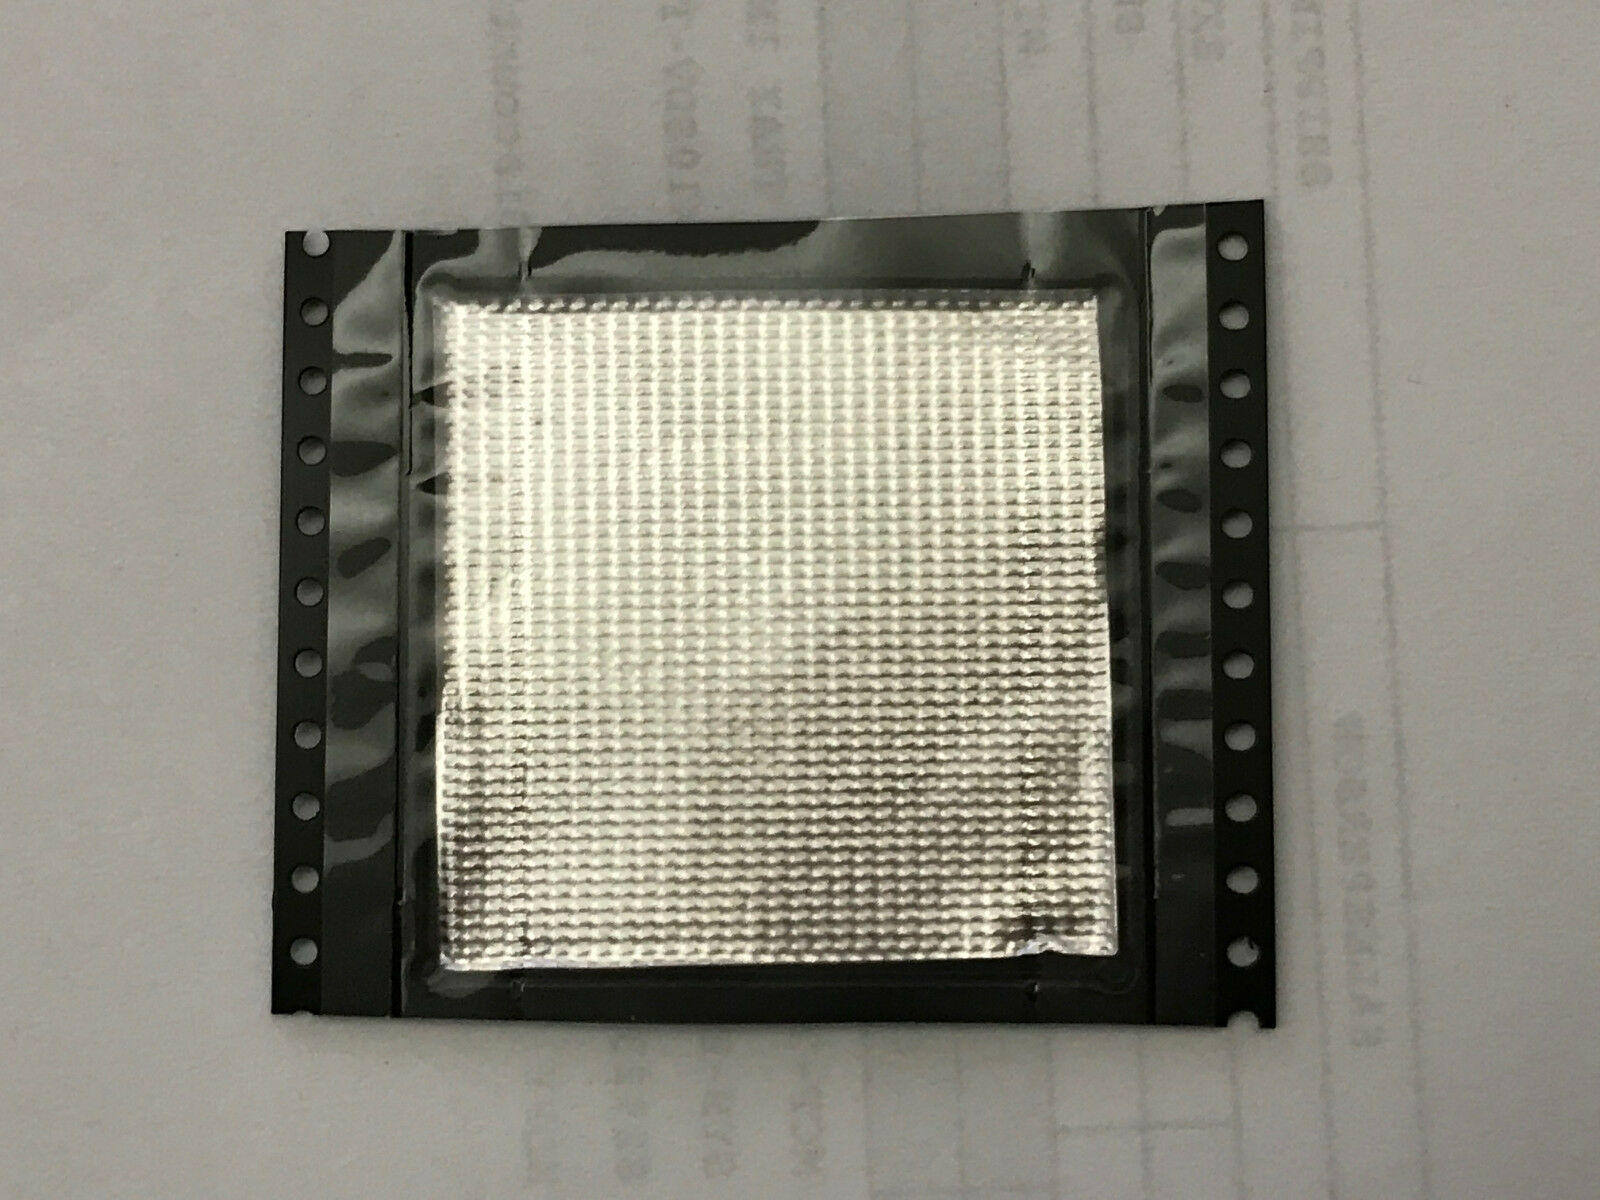 *NEW* Supermicro SNK-P0037P-TP Heatsink